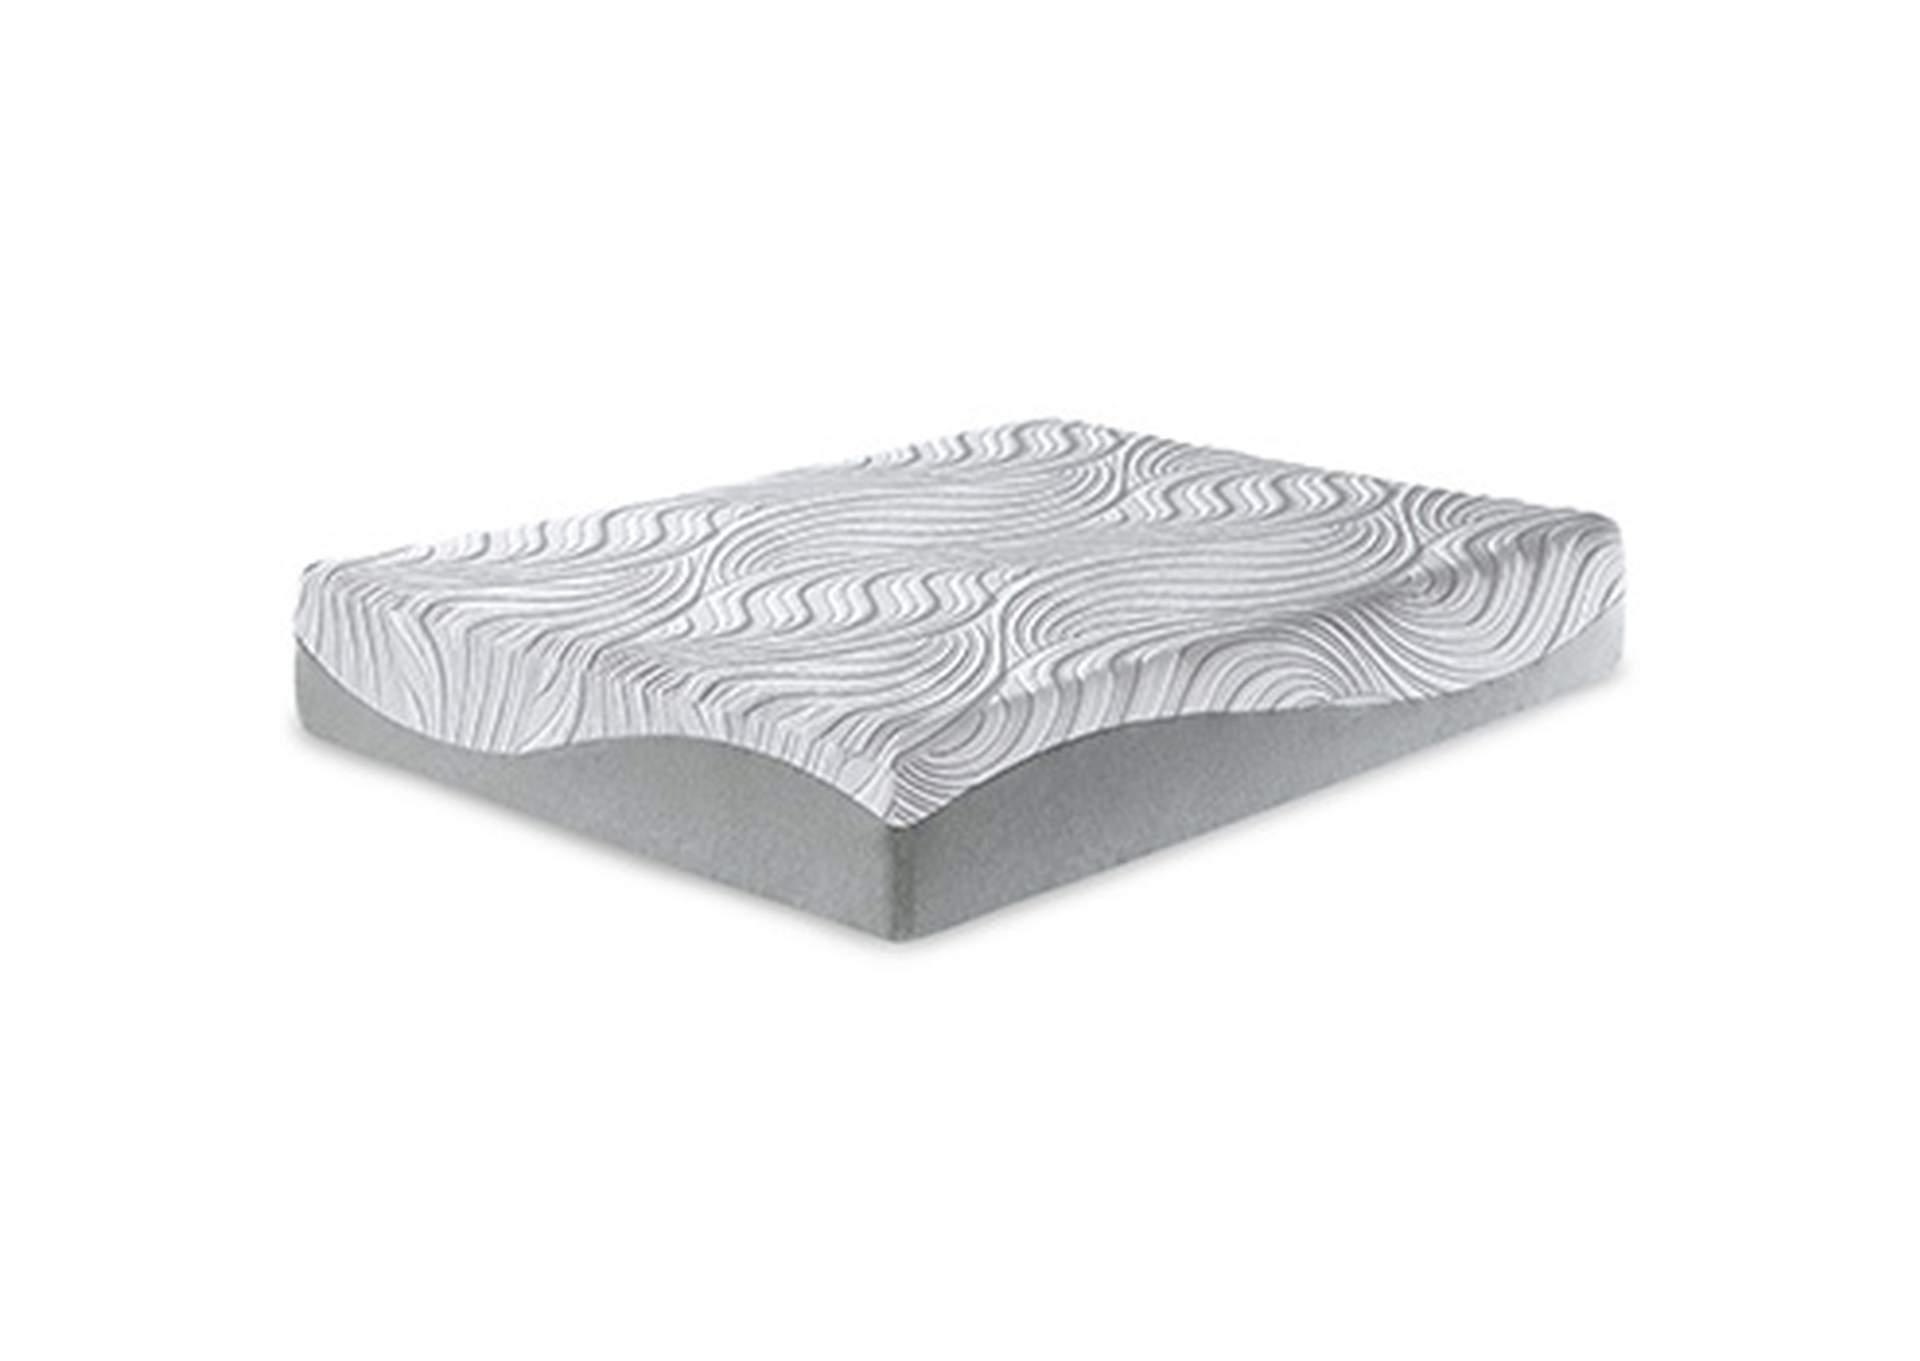 12 Inch Memory Foam King Mattress